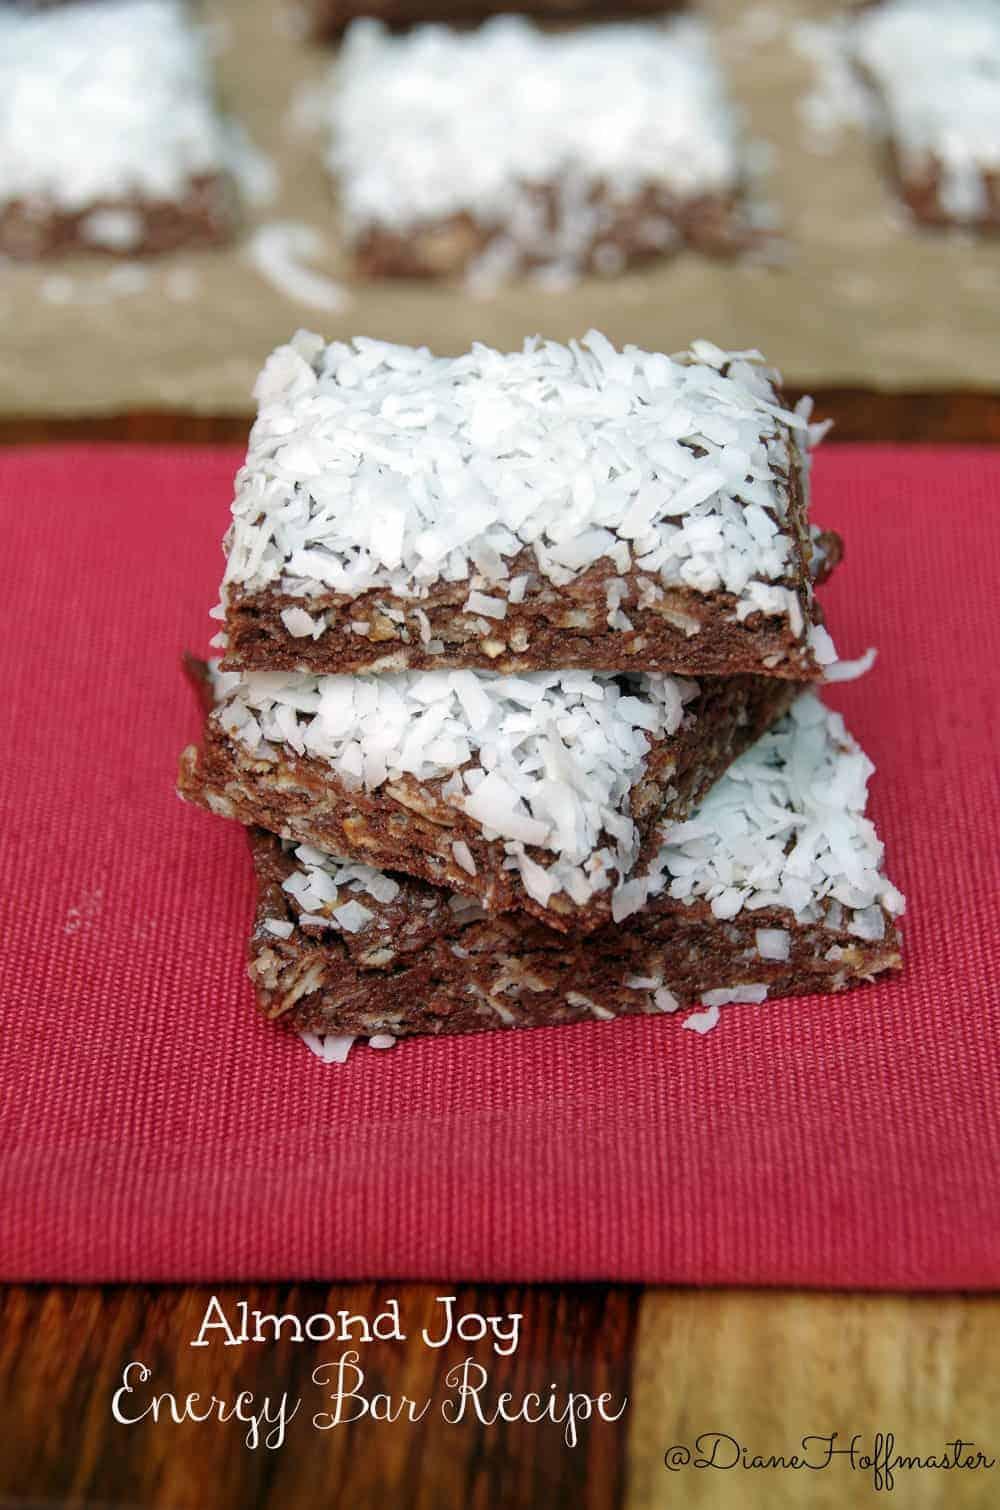 Almond Joy Energy Bar Recipe